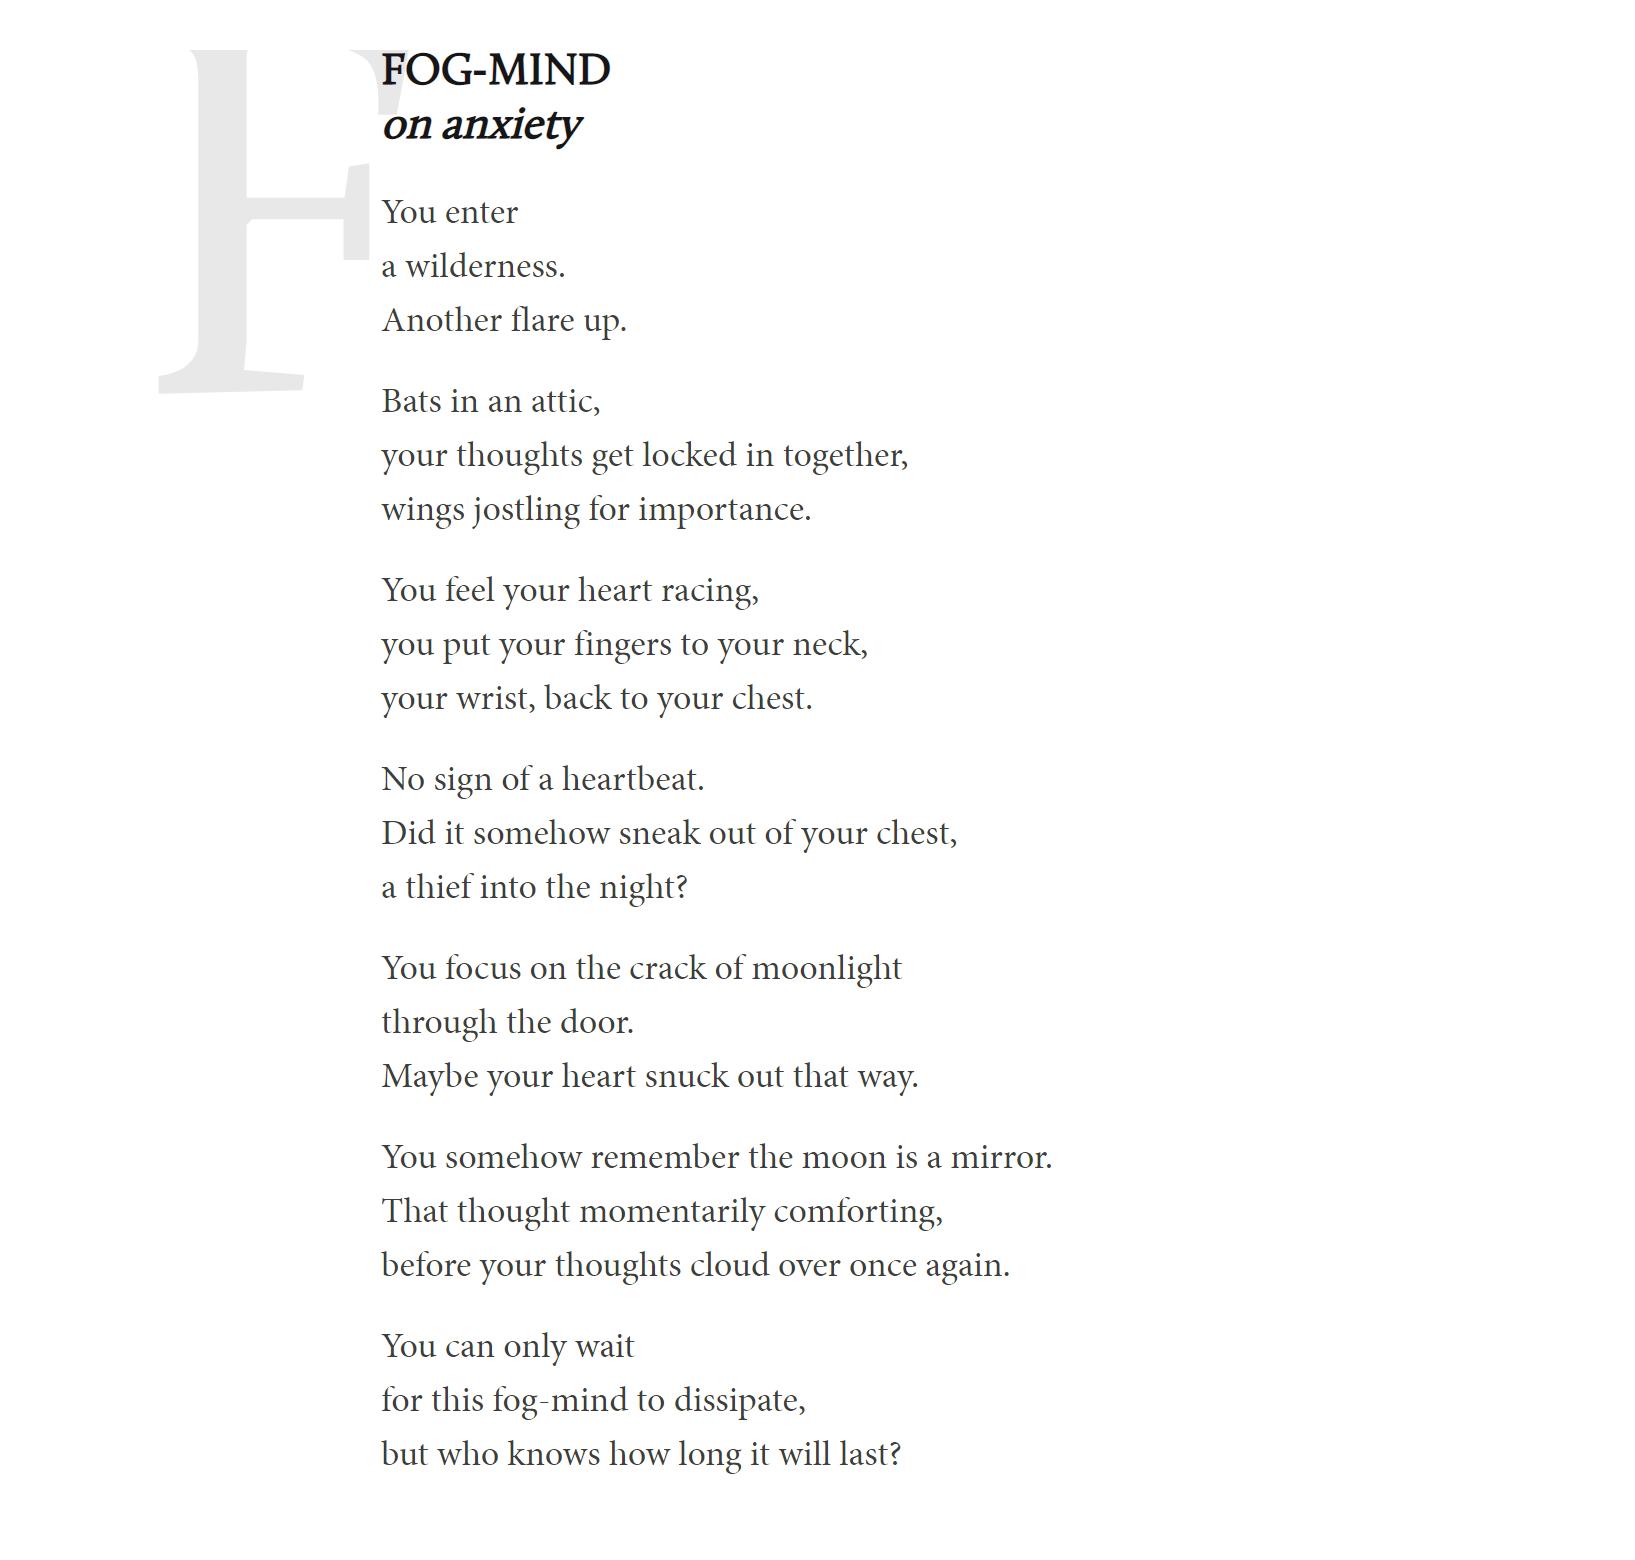 Fog-Mind By Greg Santos